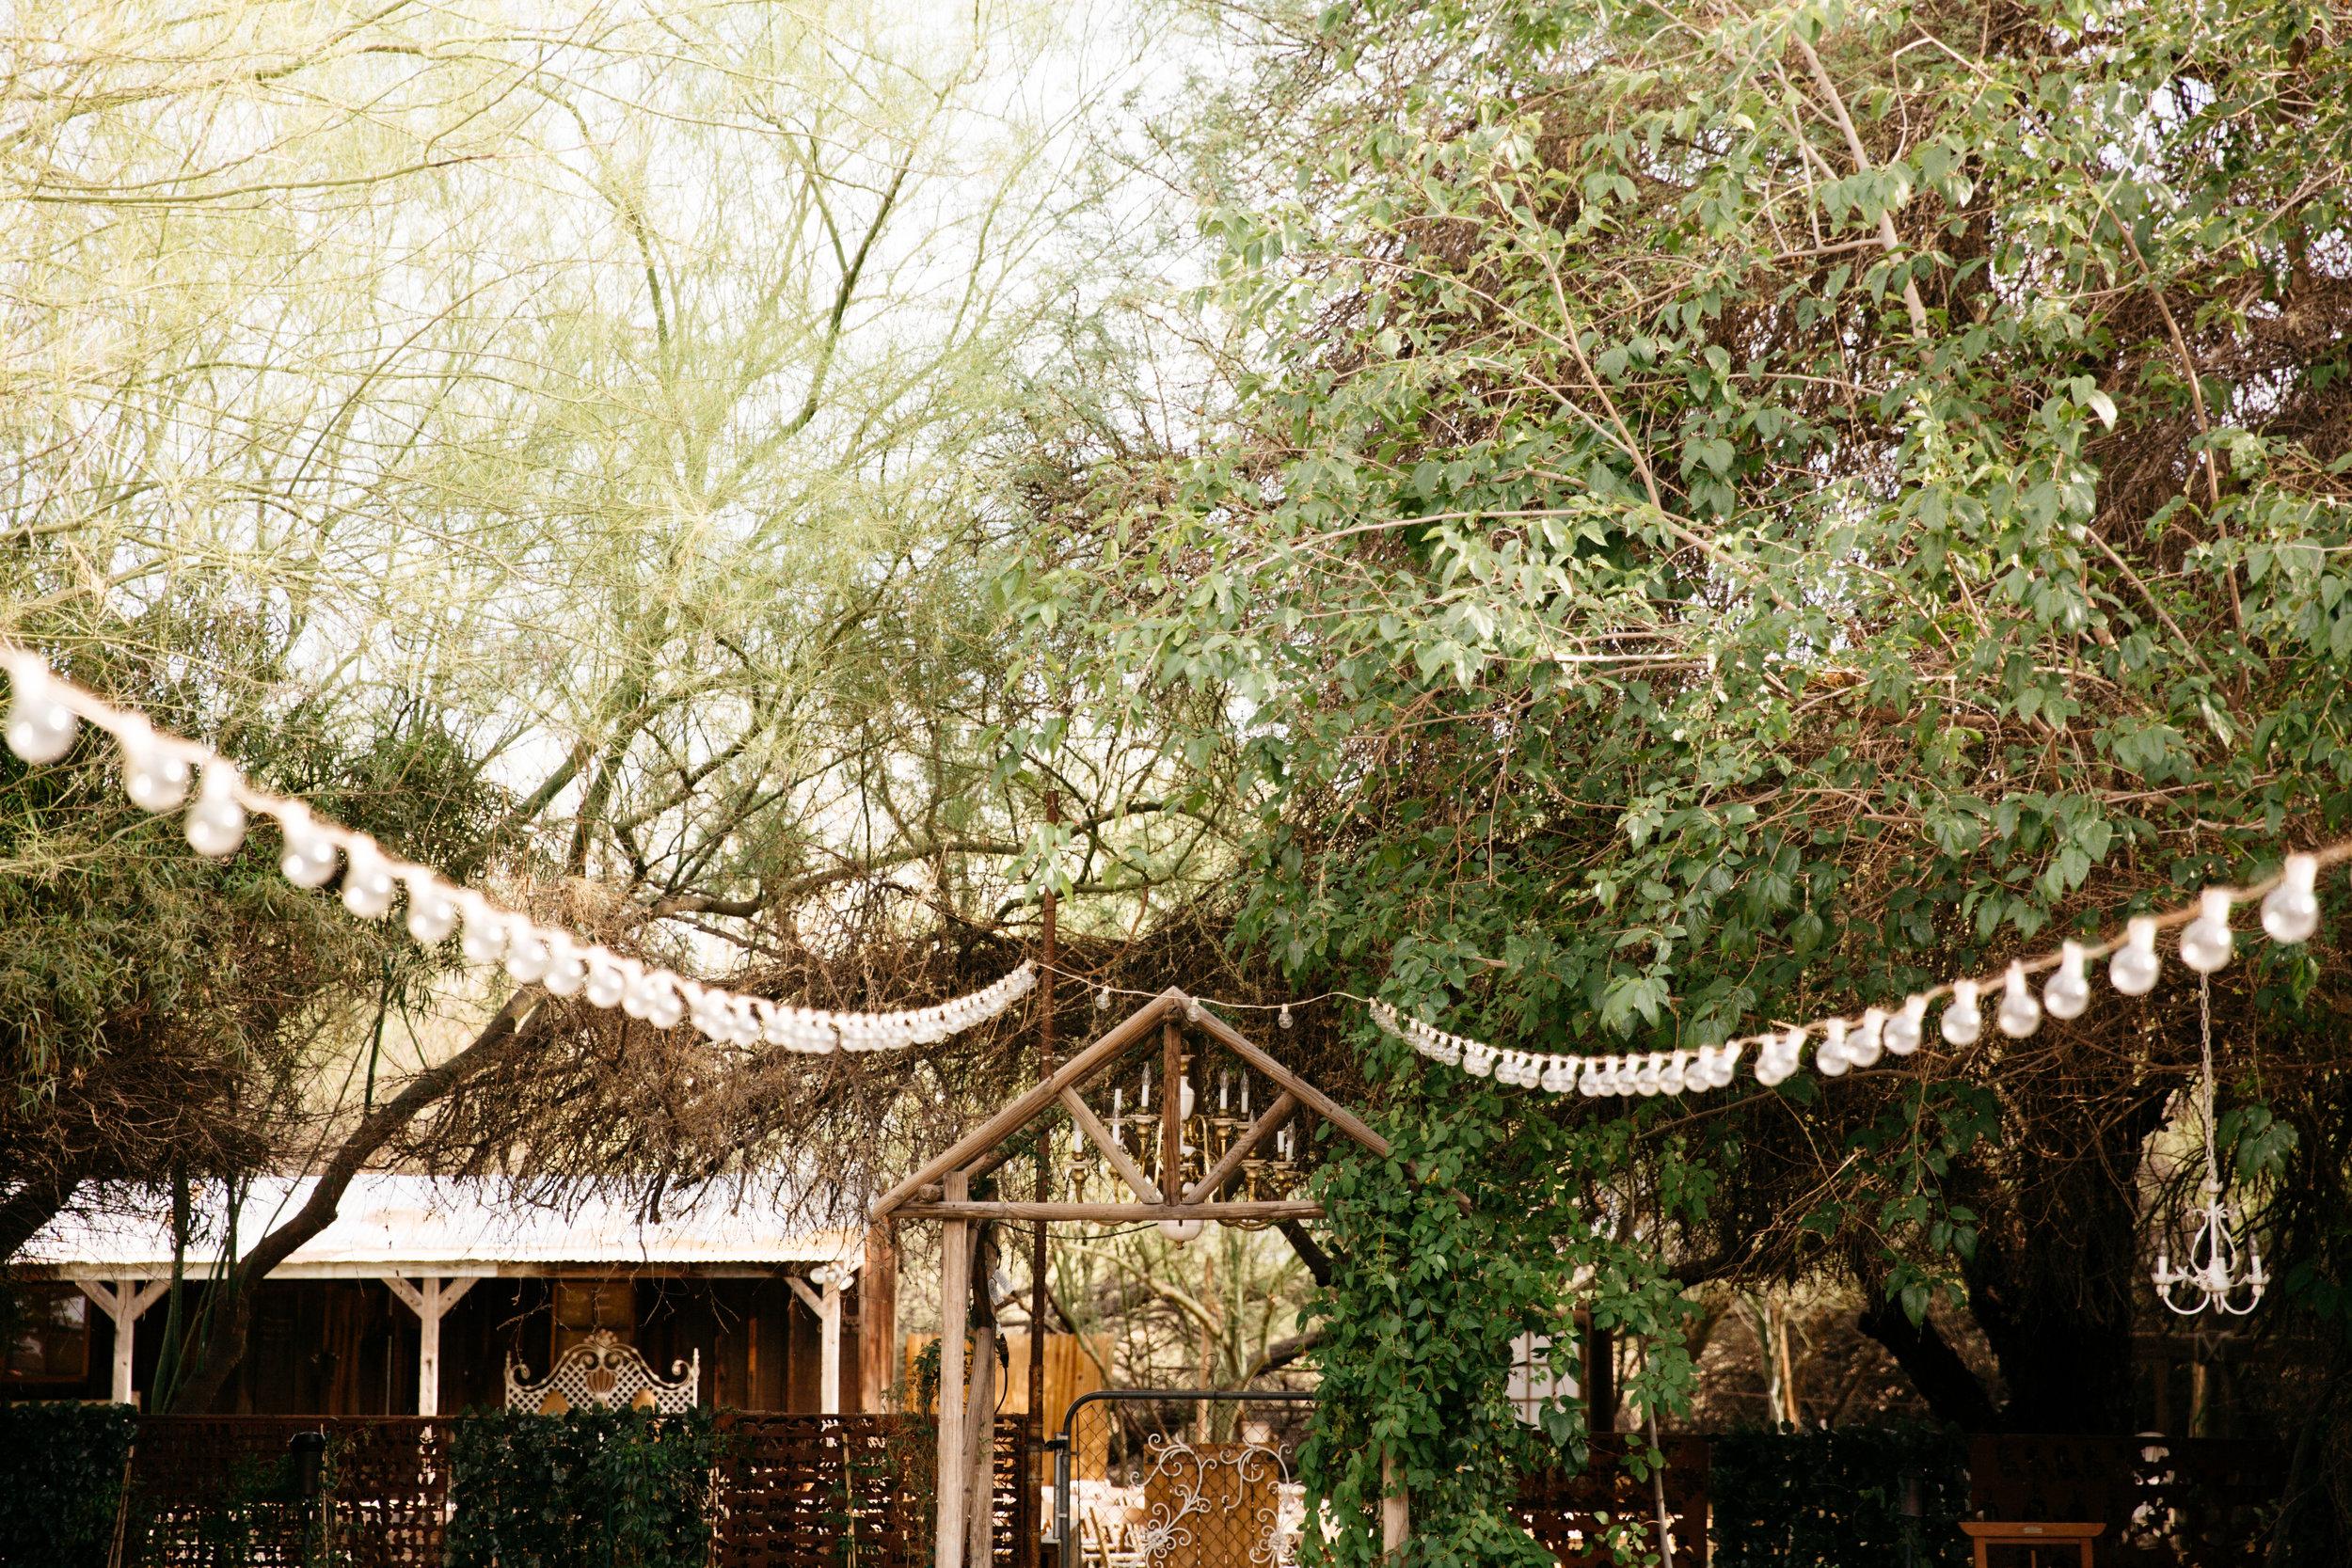 colorado-springs-wedding-photographer-39.jpg